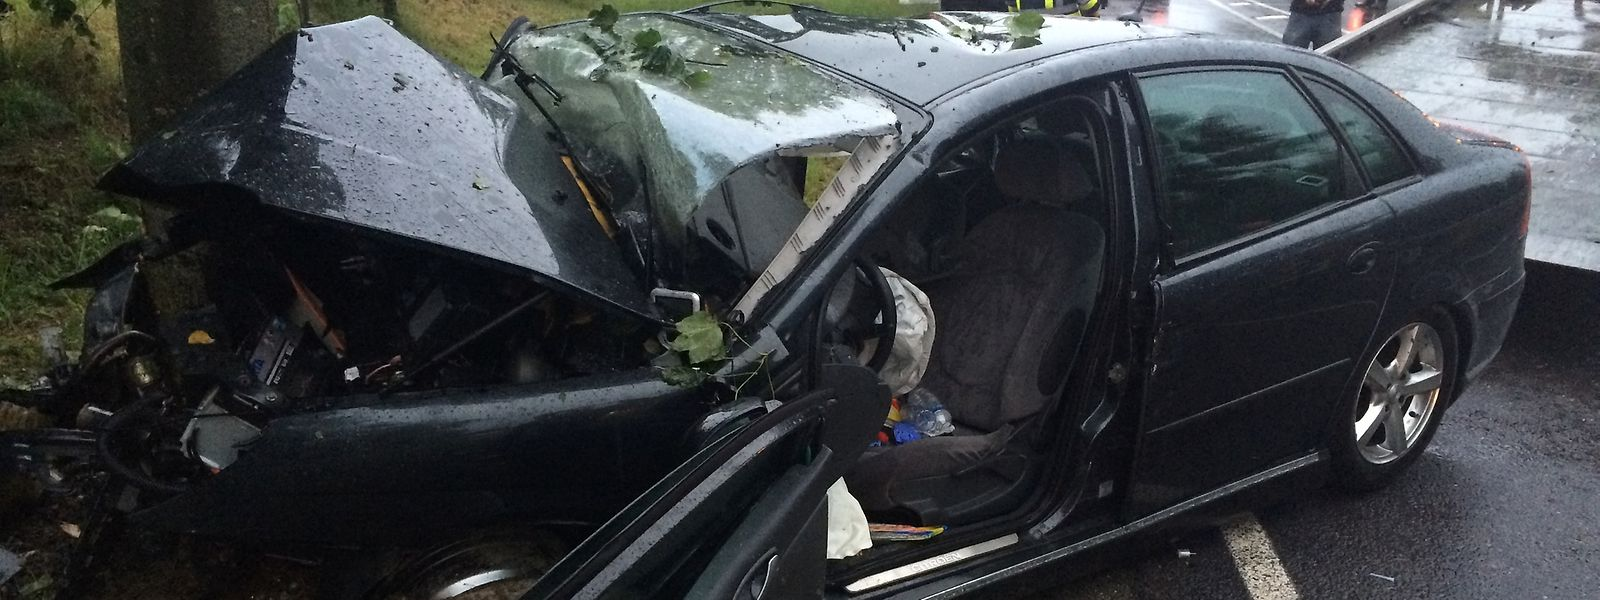 Accident Mortel A Huldange Choc Fatal Contre Un Arbre